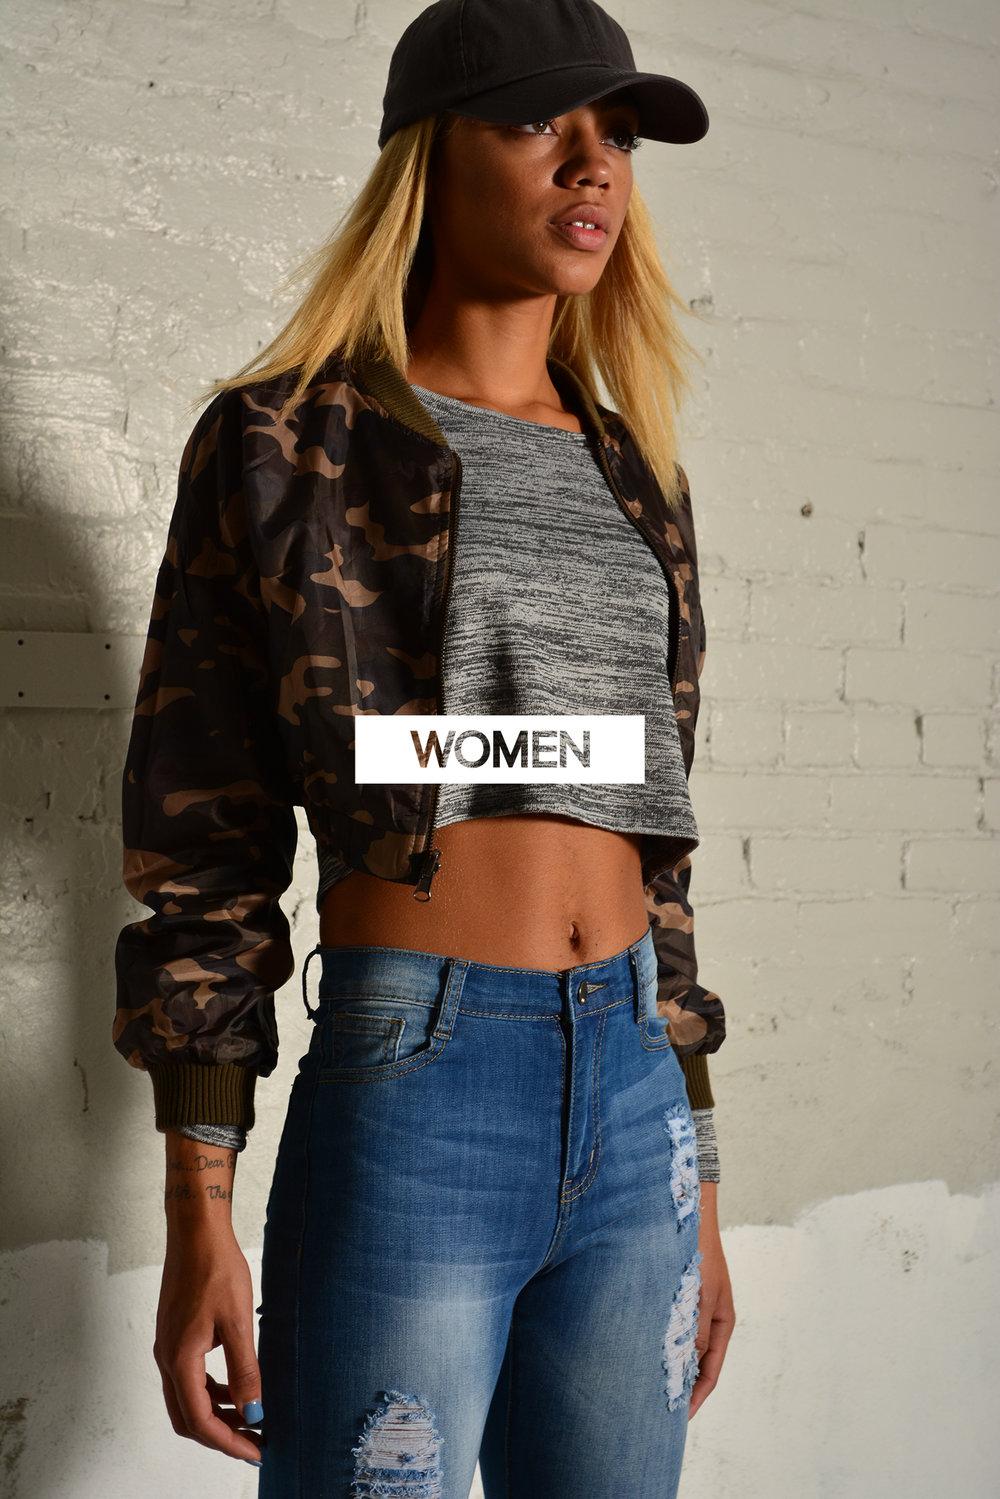 Image women.jpg